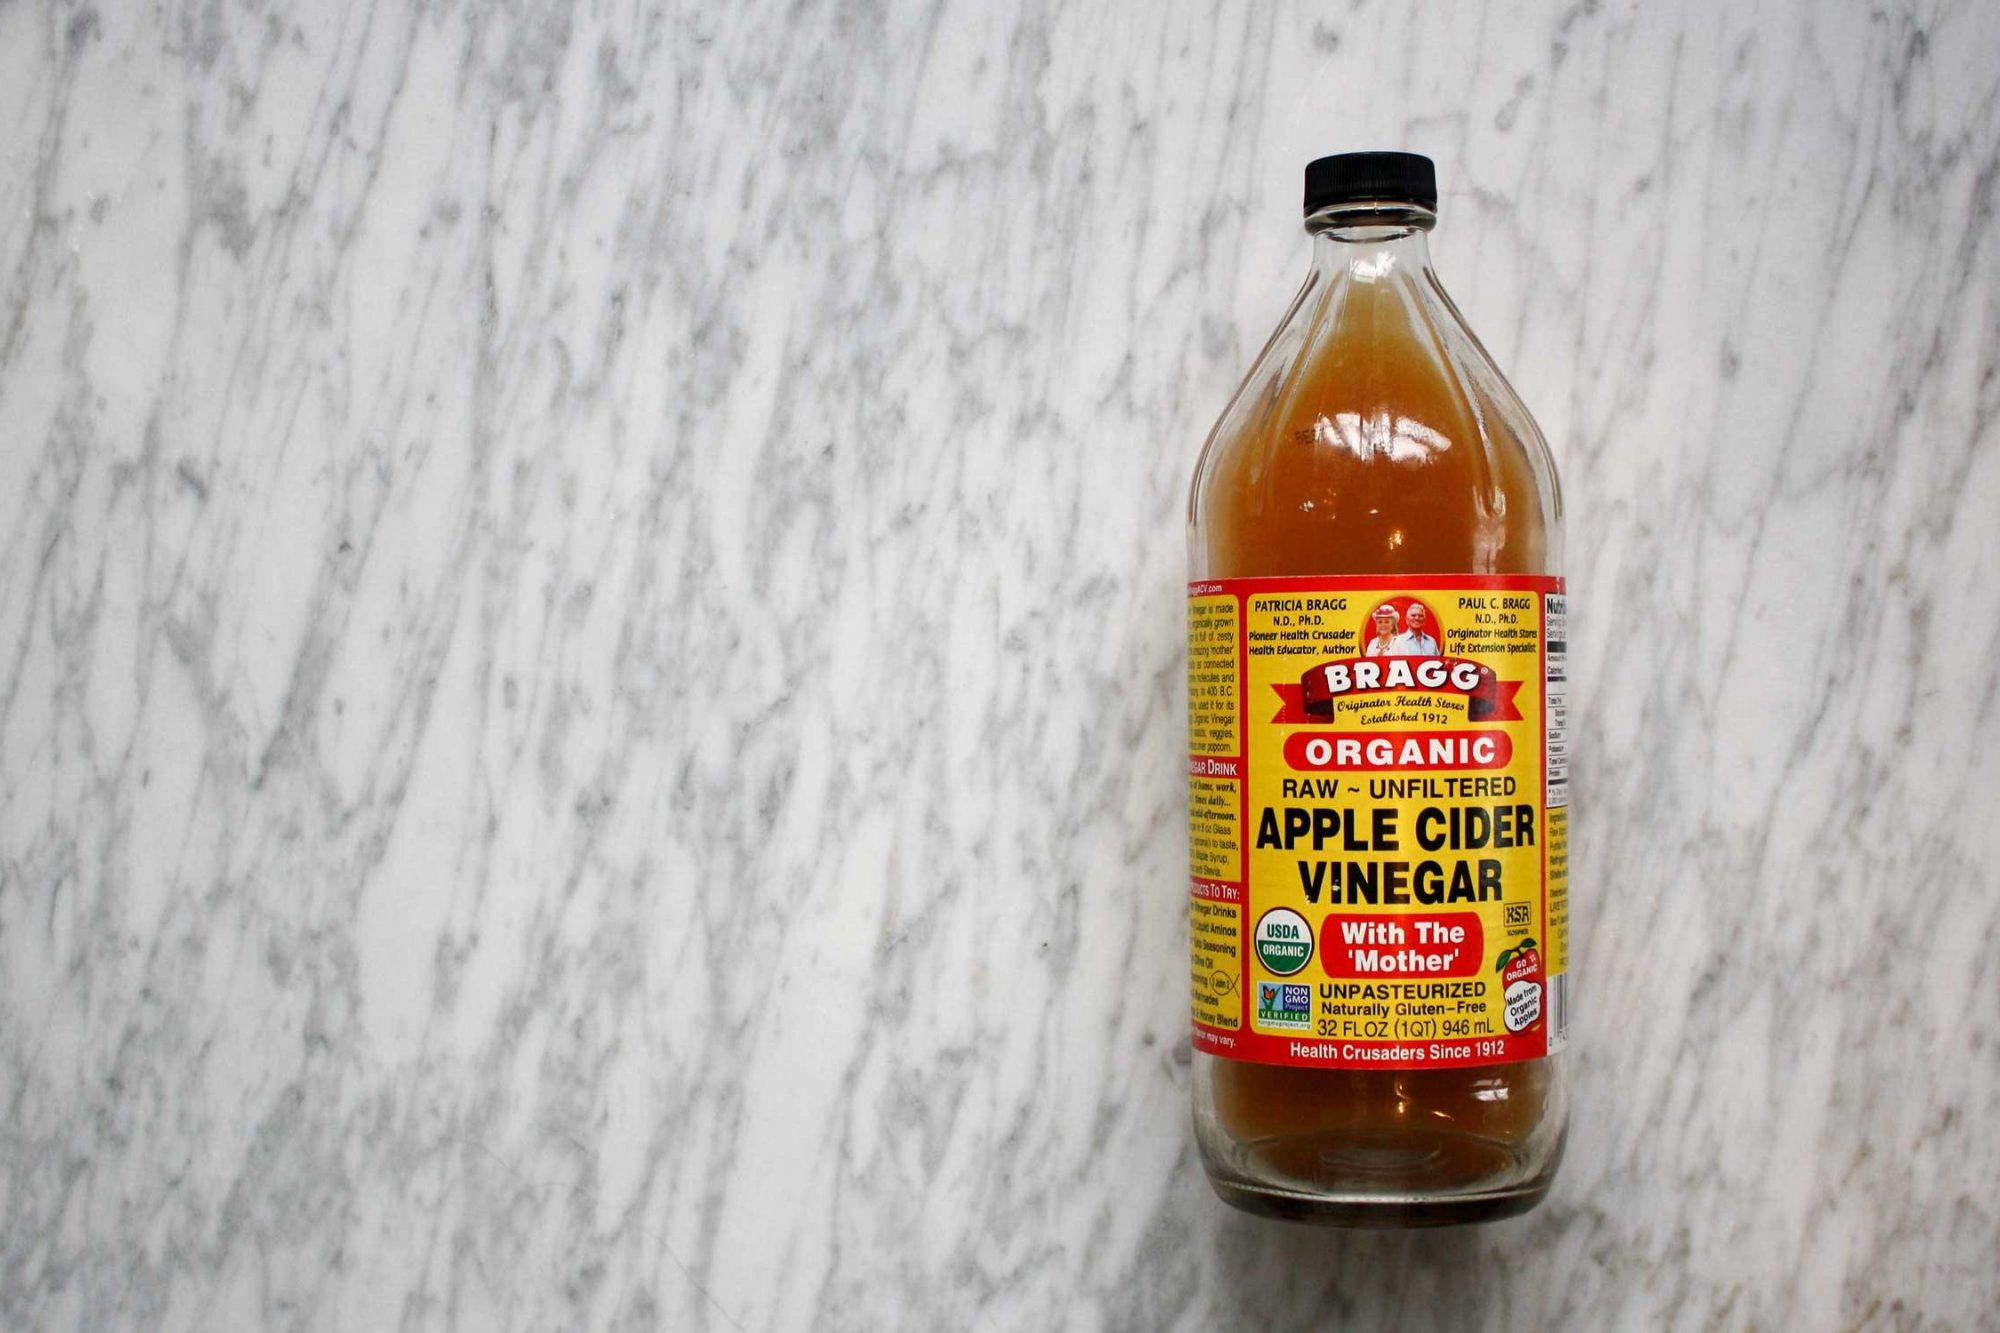 Does Apple Cider Vinegar Go Bad? | Extra Crispy